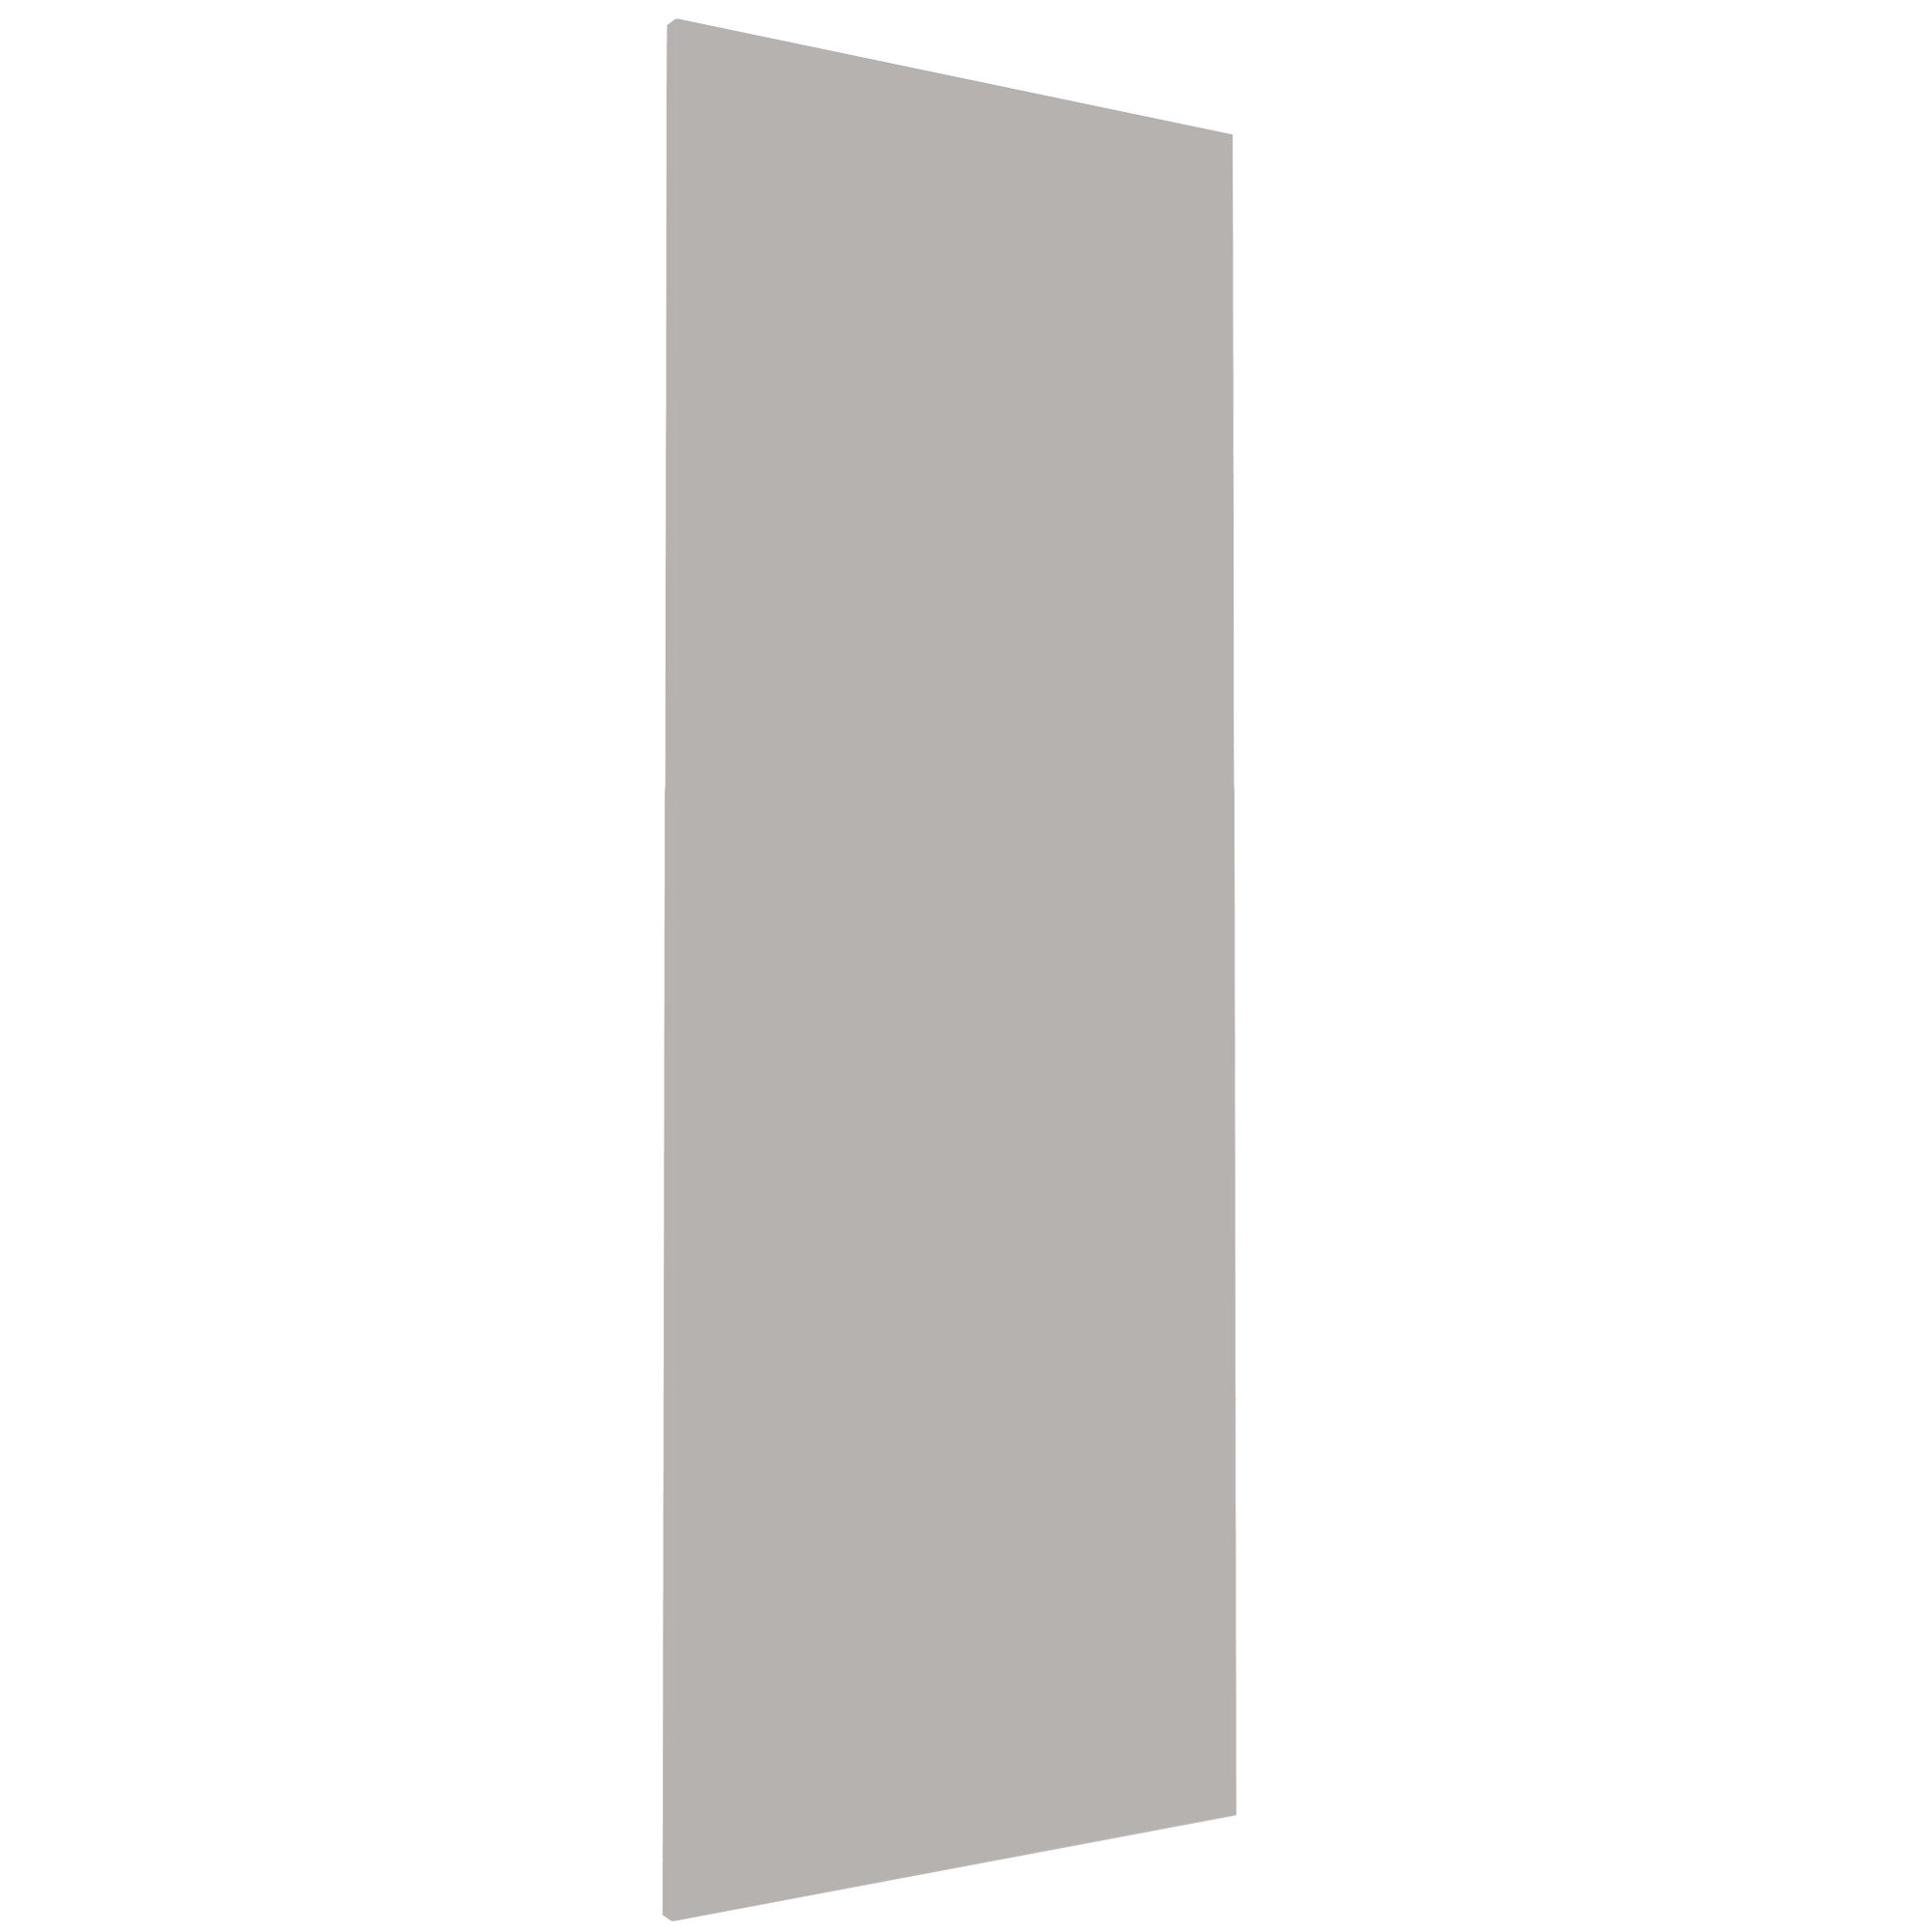 Darwin Modular Grey & Matt Wardrobe Door (h)1456mm (w)497mm (d)16mm